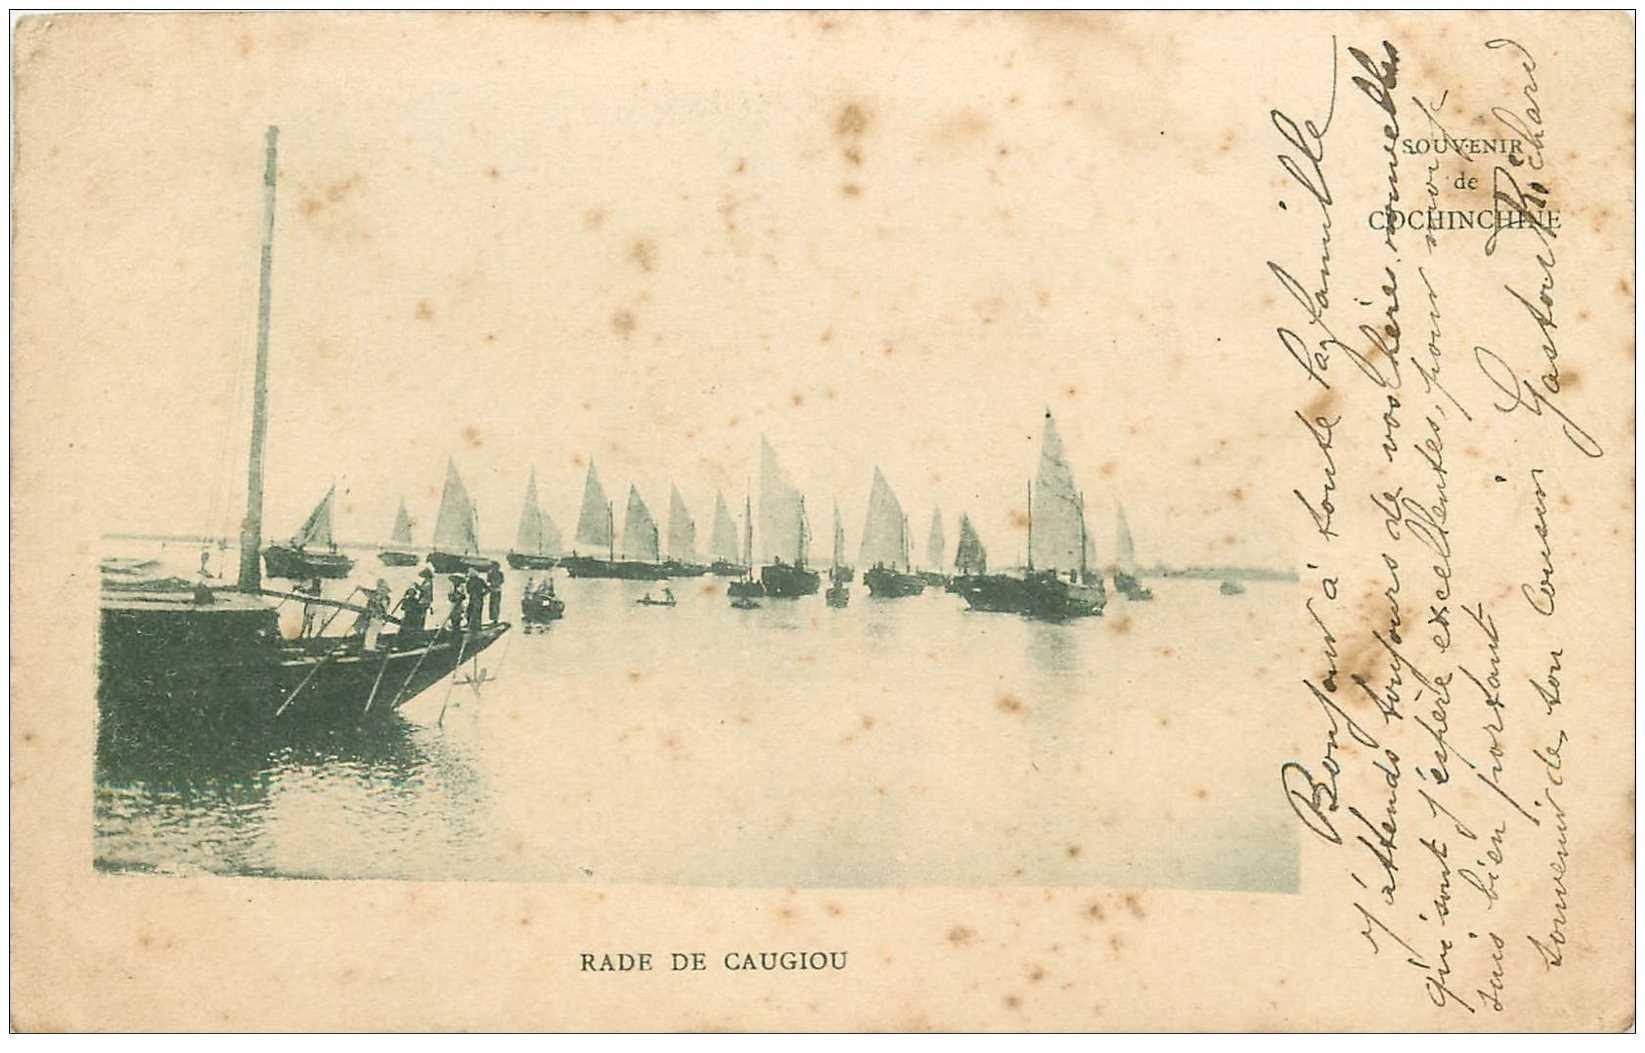 carte postale ancienne VIET-NAM. Cochinchine. Rade de Caugiou 1904. Timbre manquant...